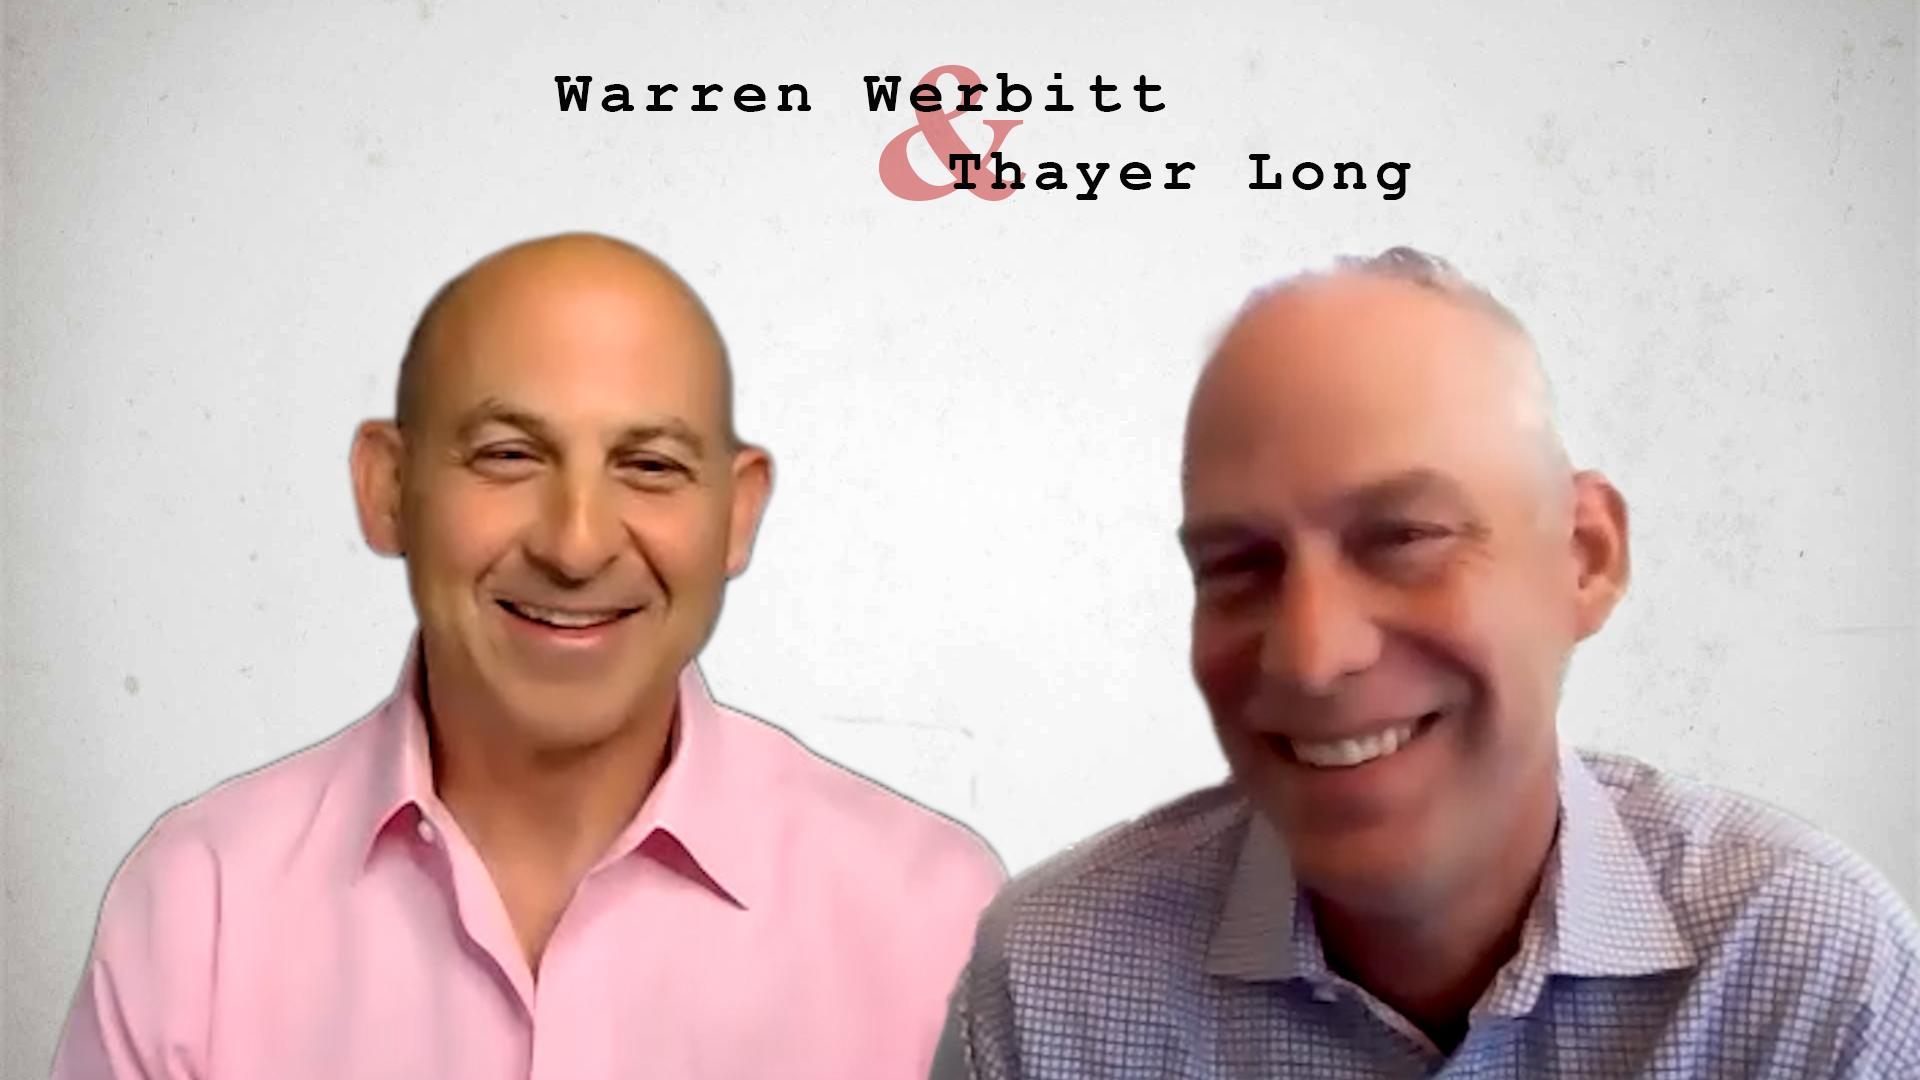 Video preview: Warren Werbitt Goes Printer to Printer with Thayer Long